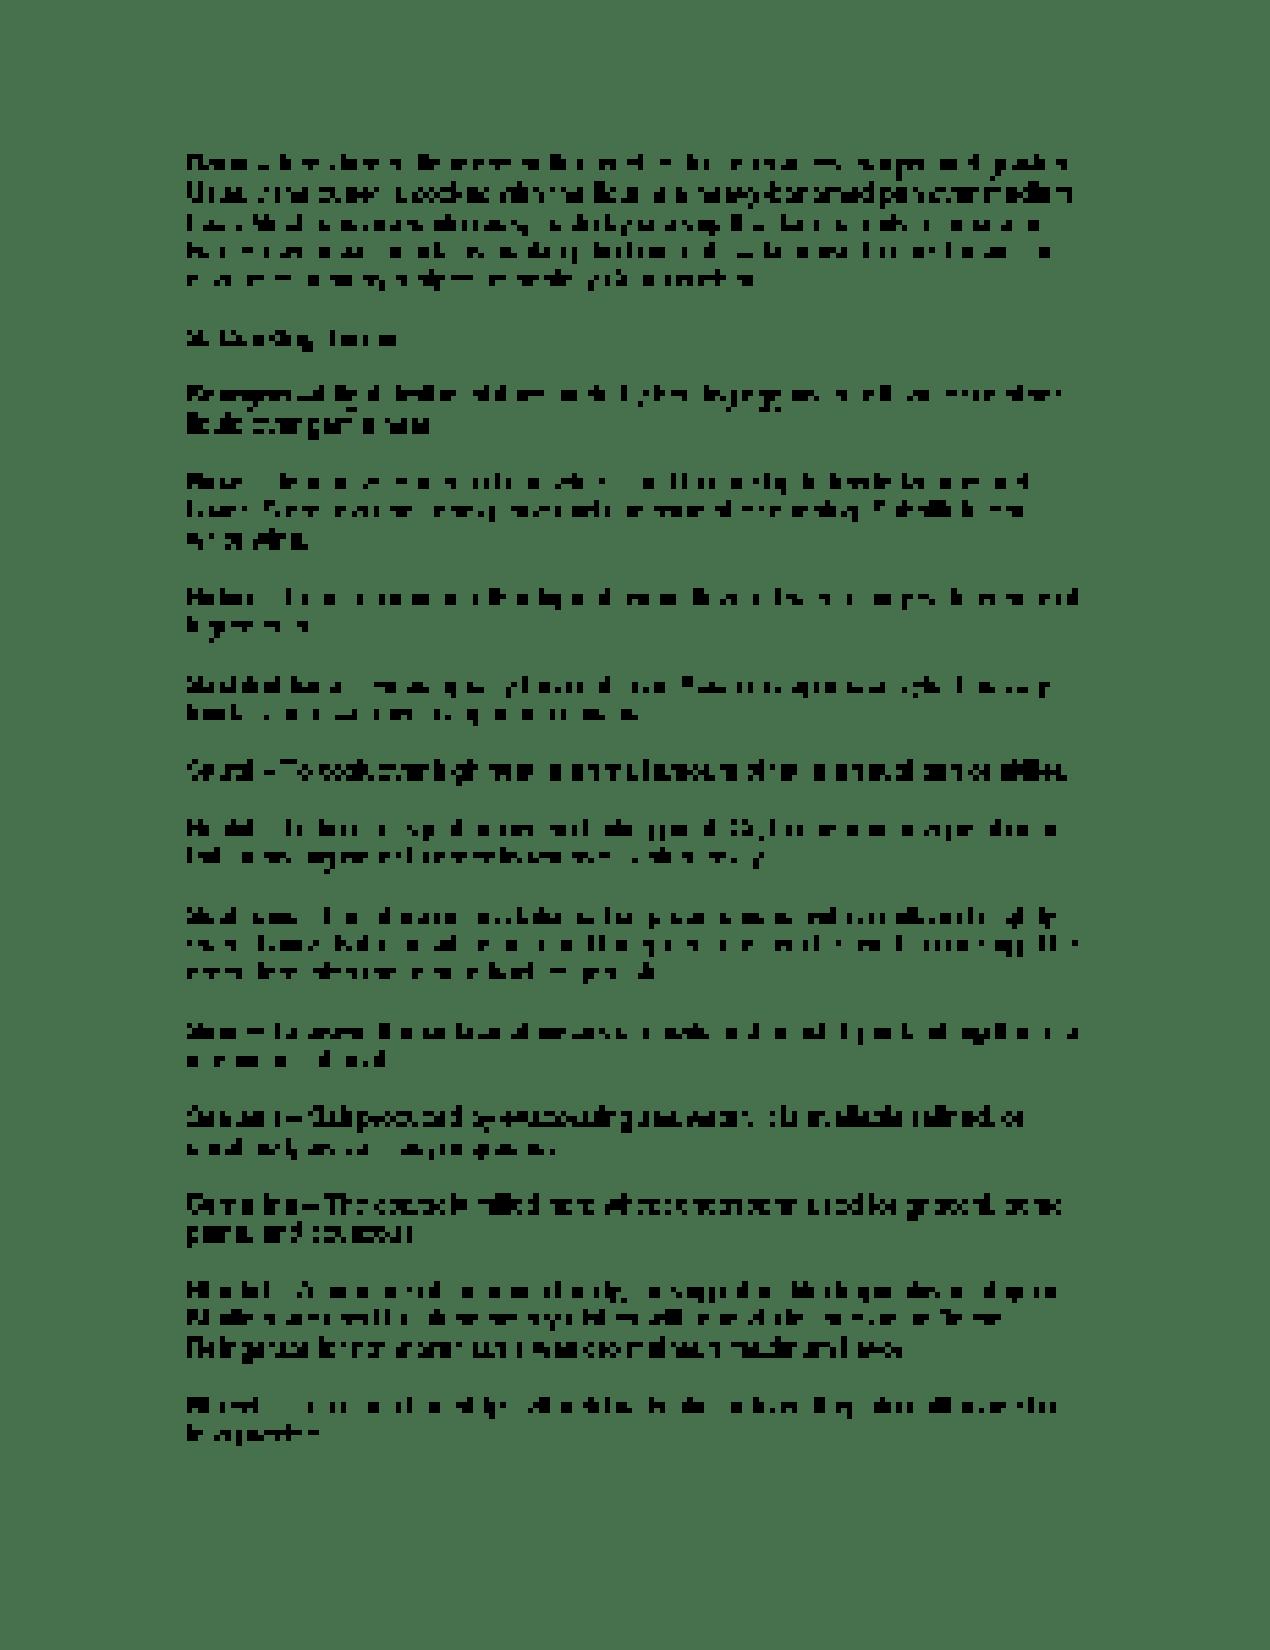 worksheet. Family Life Merit Badge Worksheet Answers